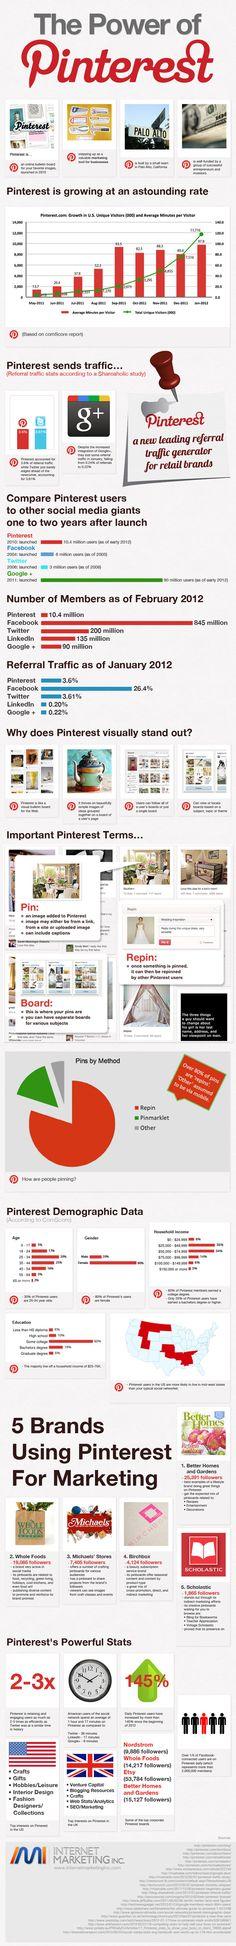 Pinterest boom